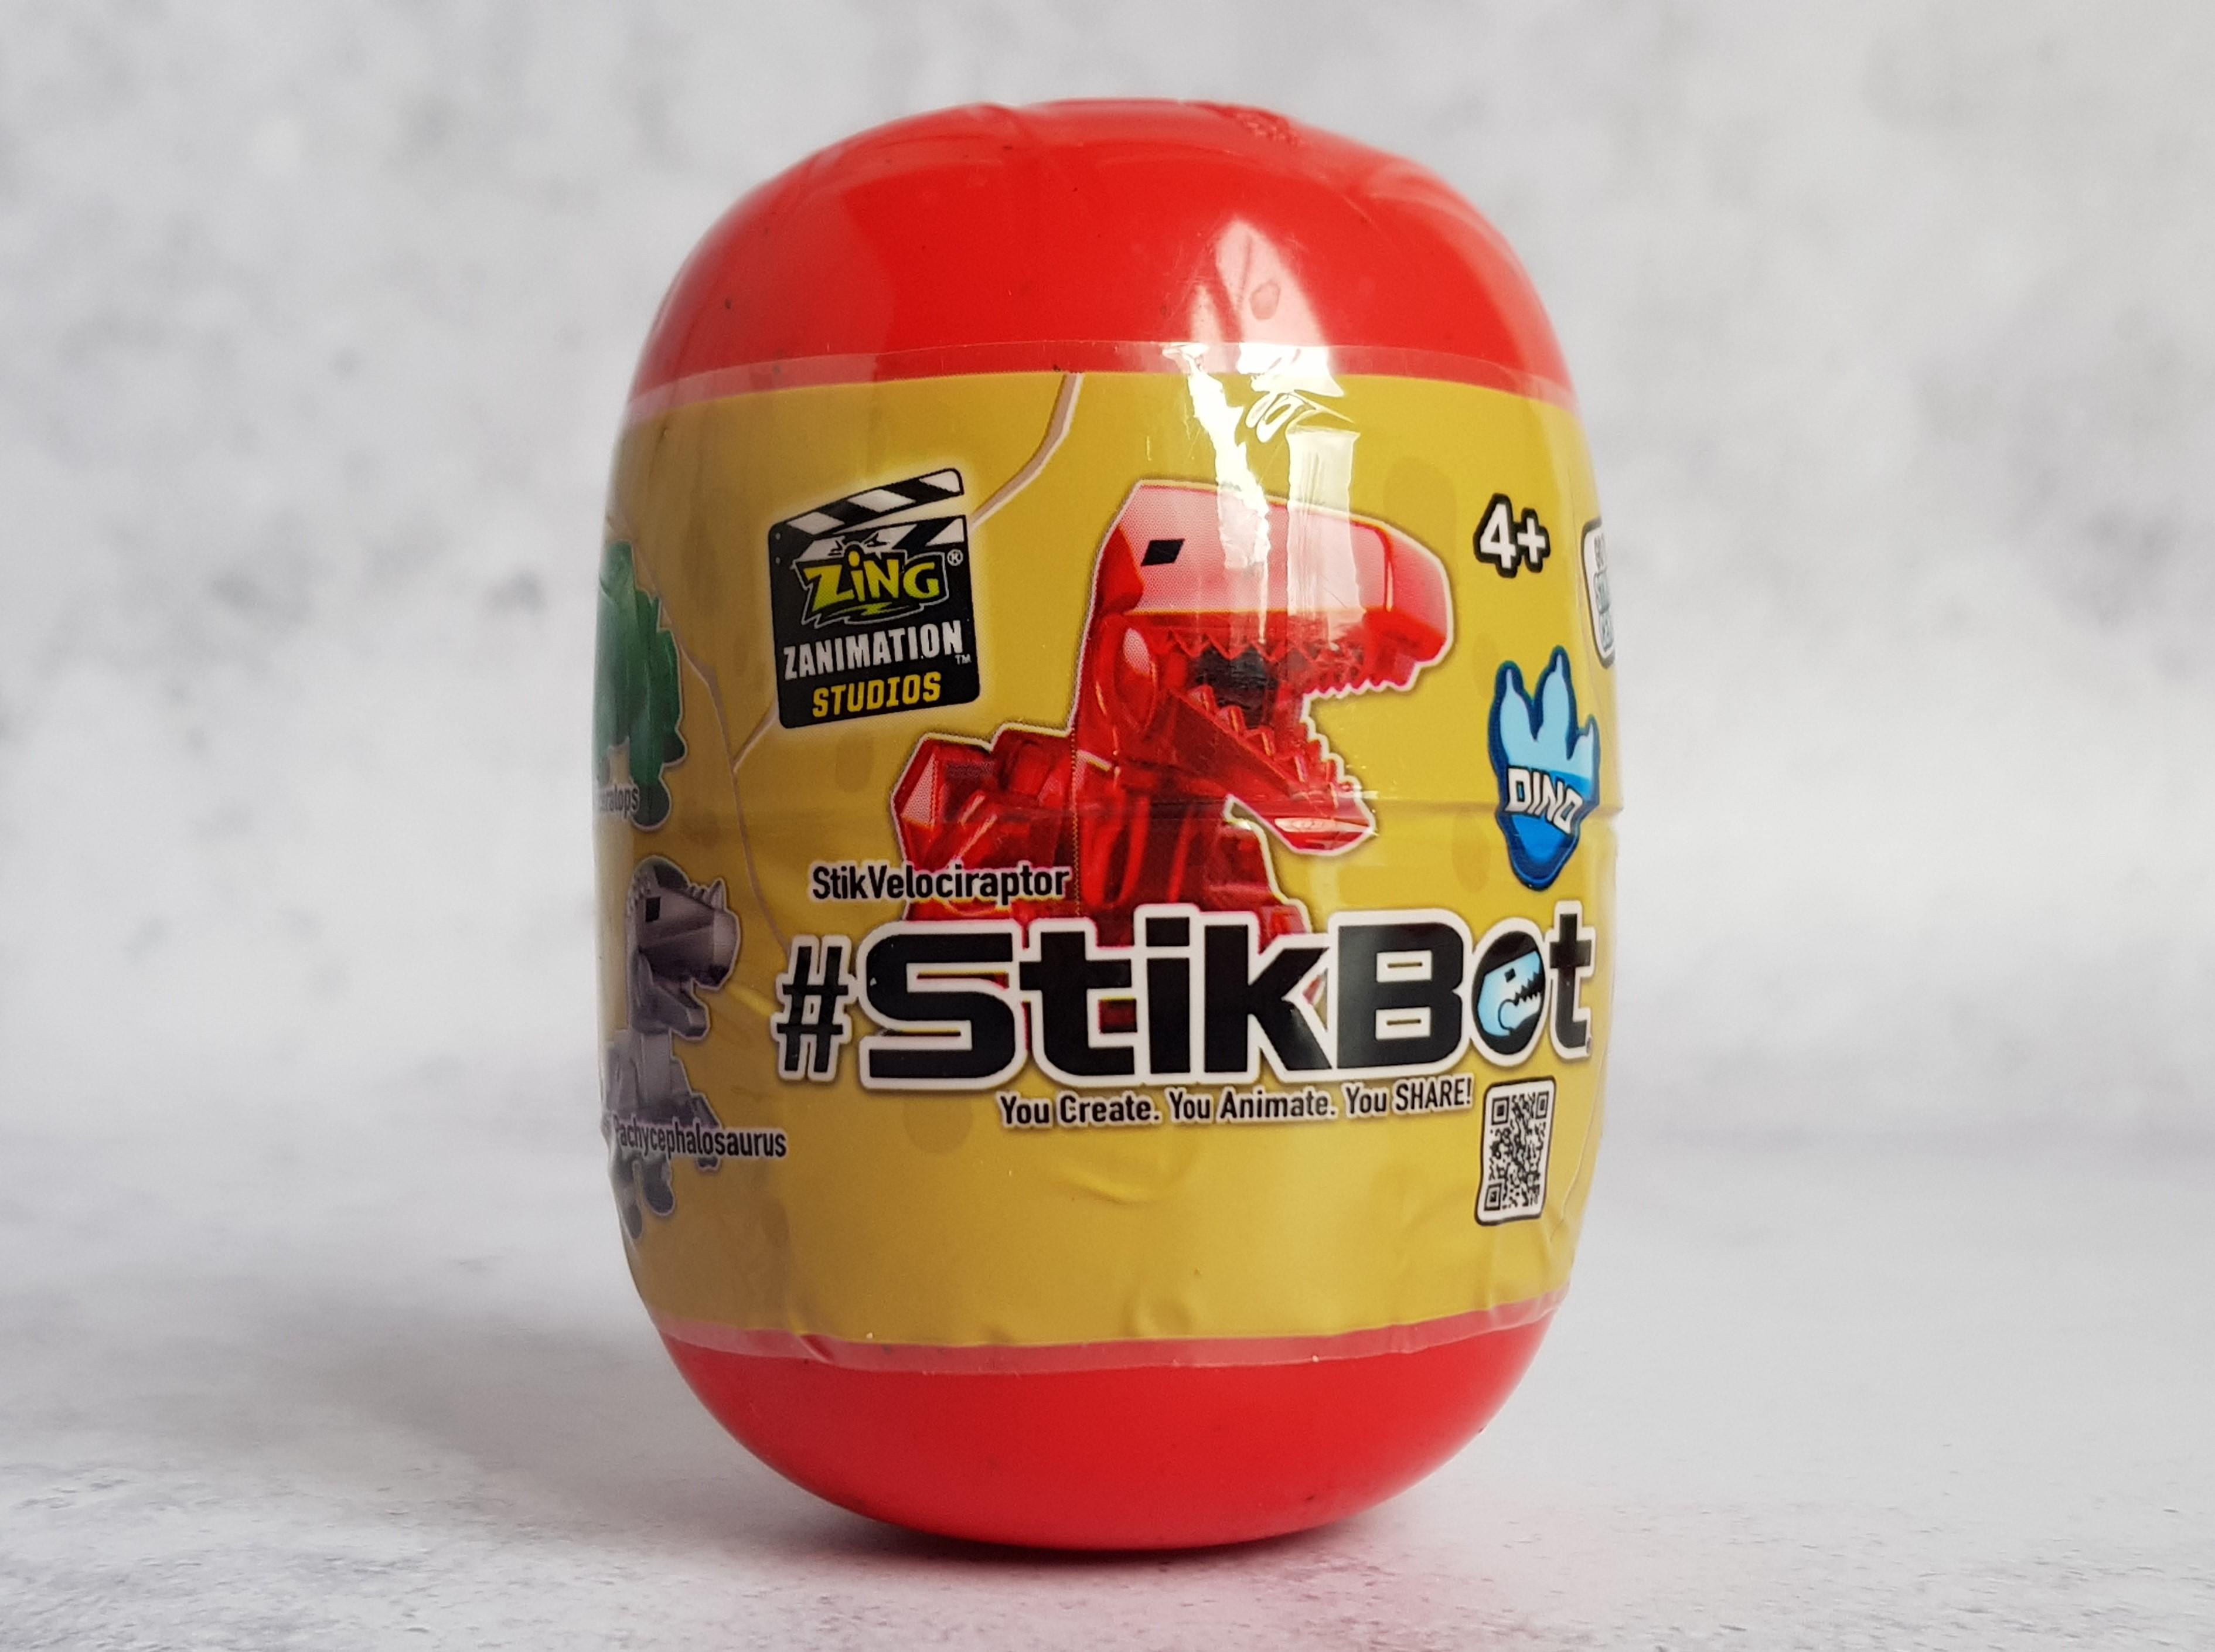 Stikbot egg